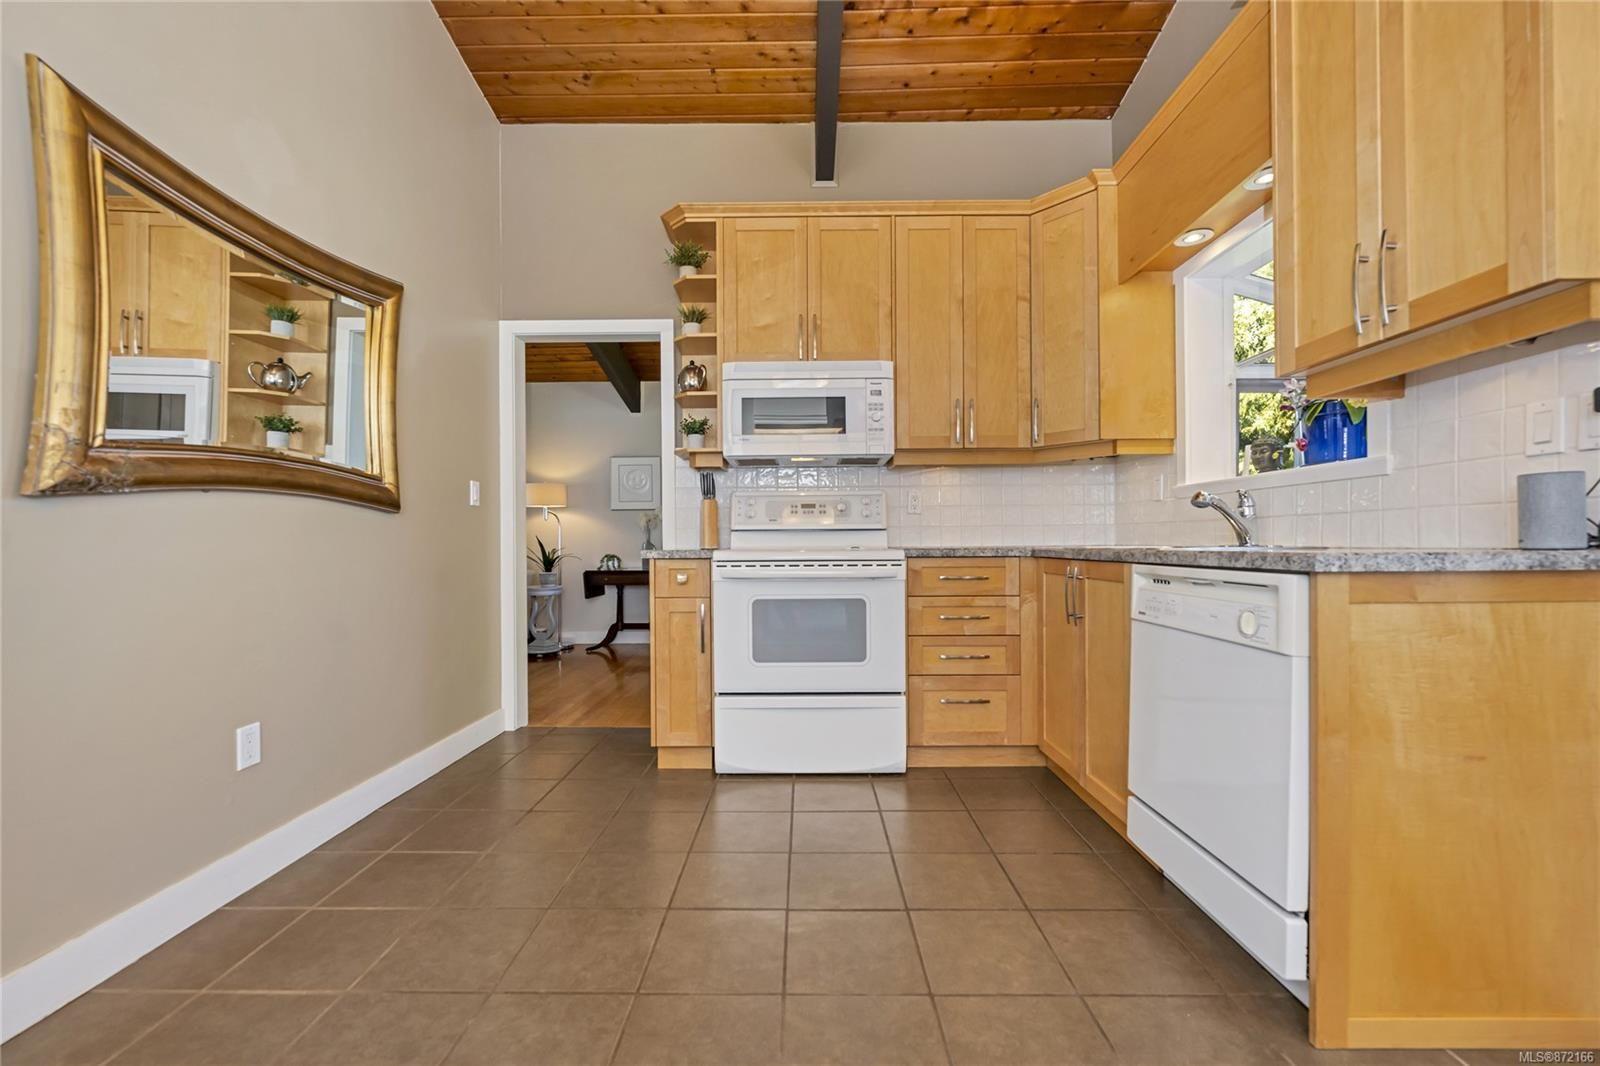 Photo 8: Photos: 1690 Blair Ave in : SE Lambrick Park House for sale (Saanich East)  : MLS®# 872166